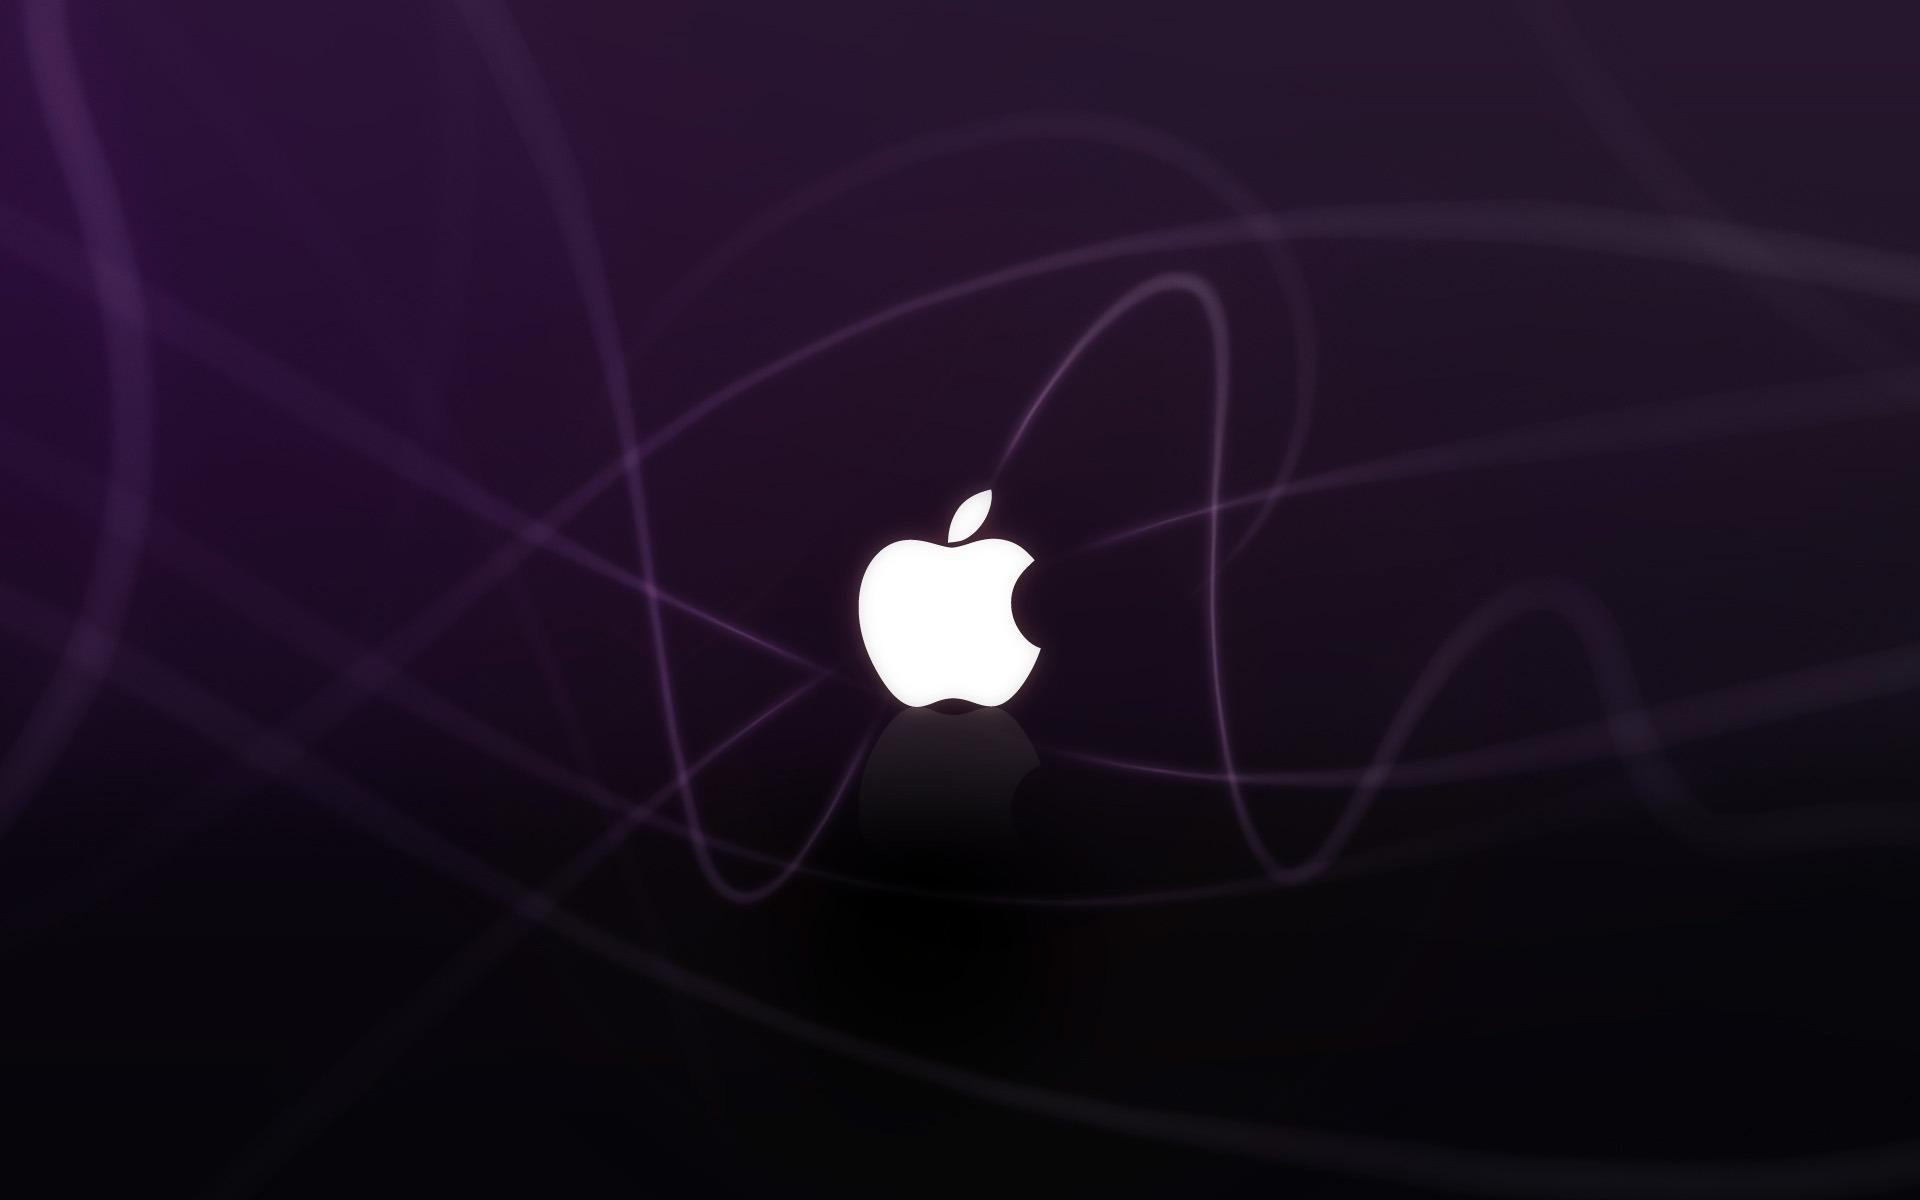 Apple HD Wallpapers | Apple Logo Desktop Backgrounds - Page 1